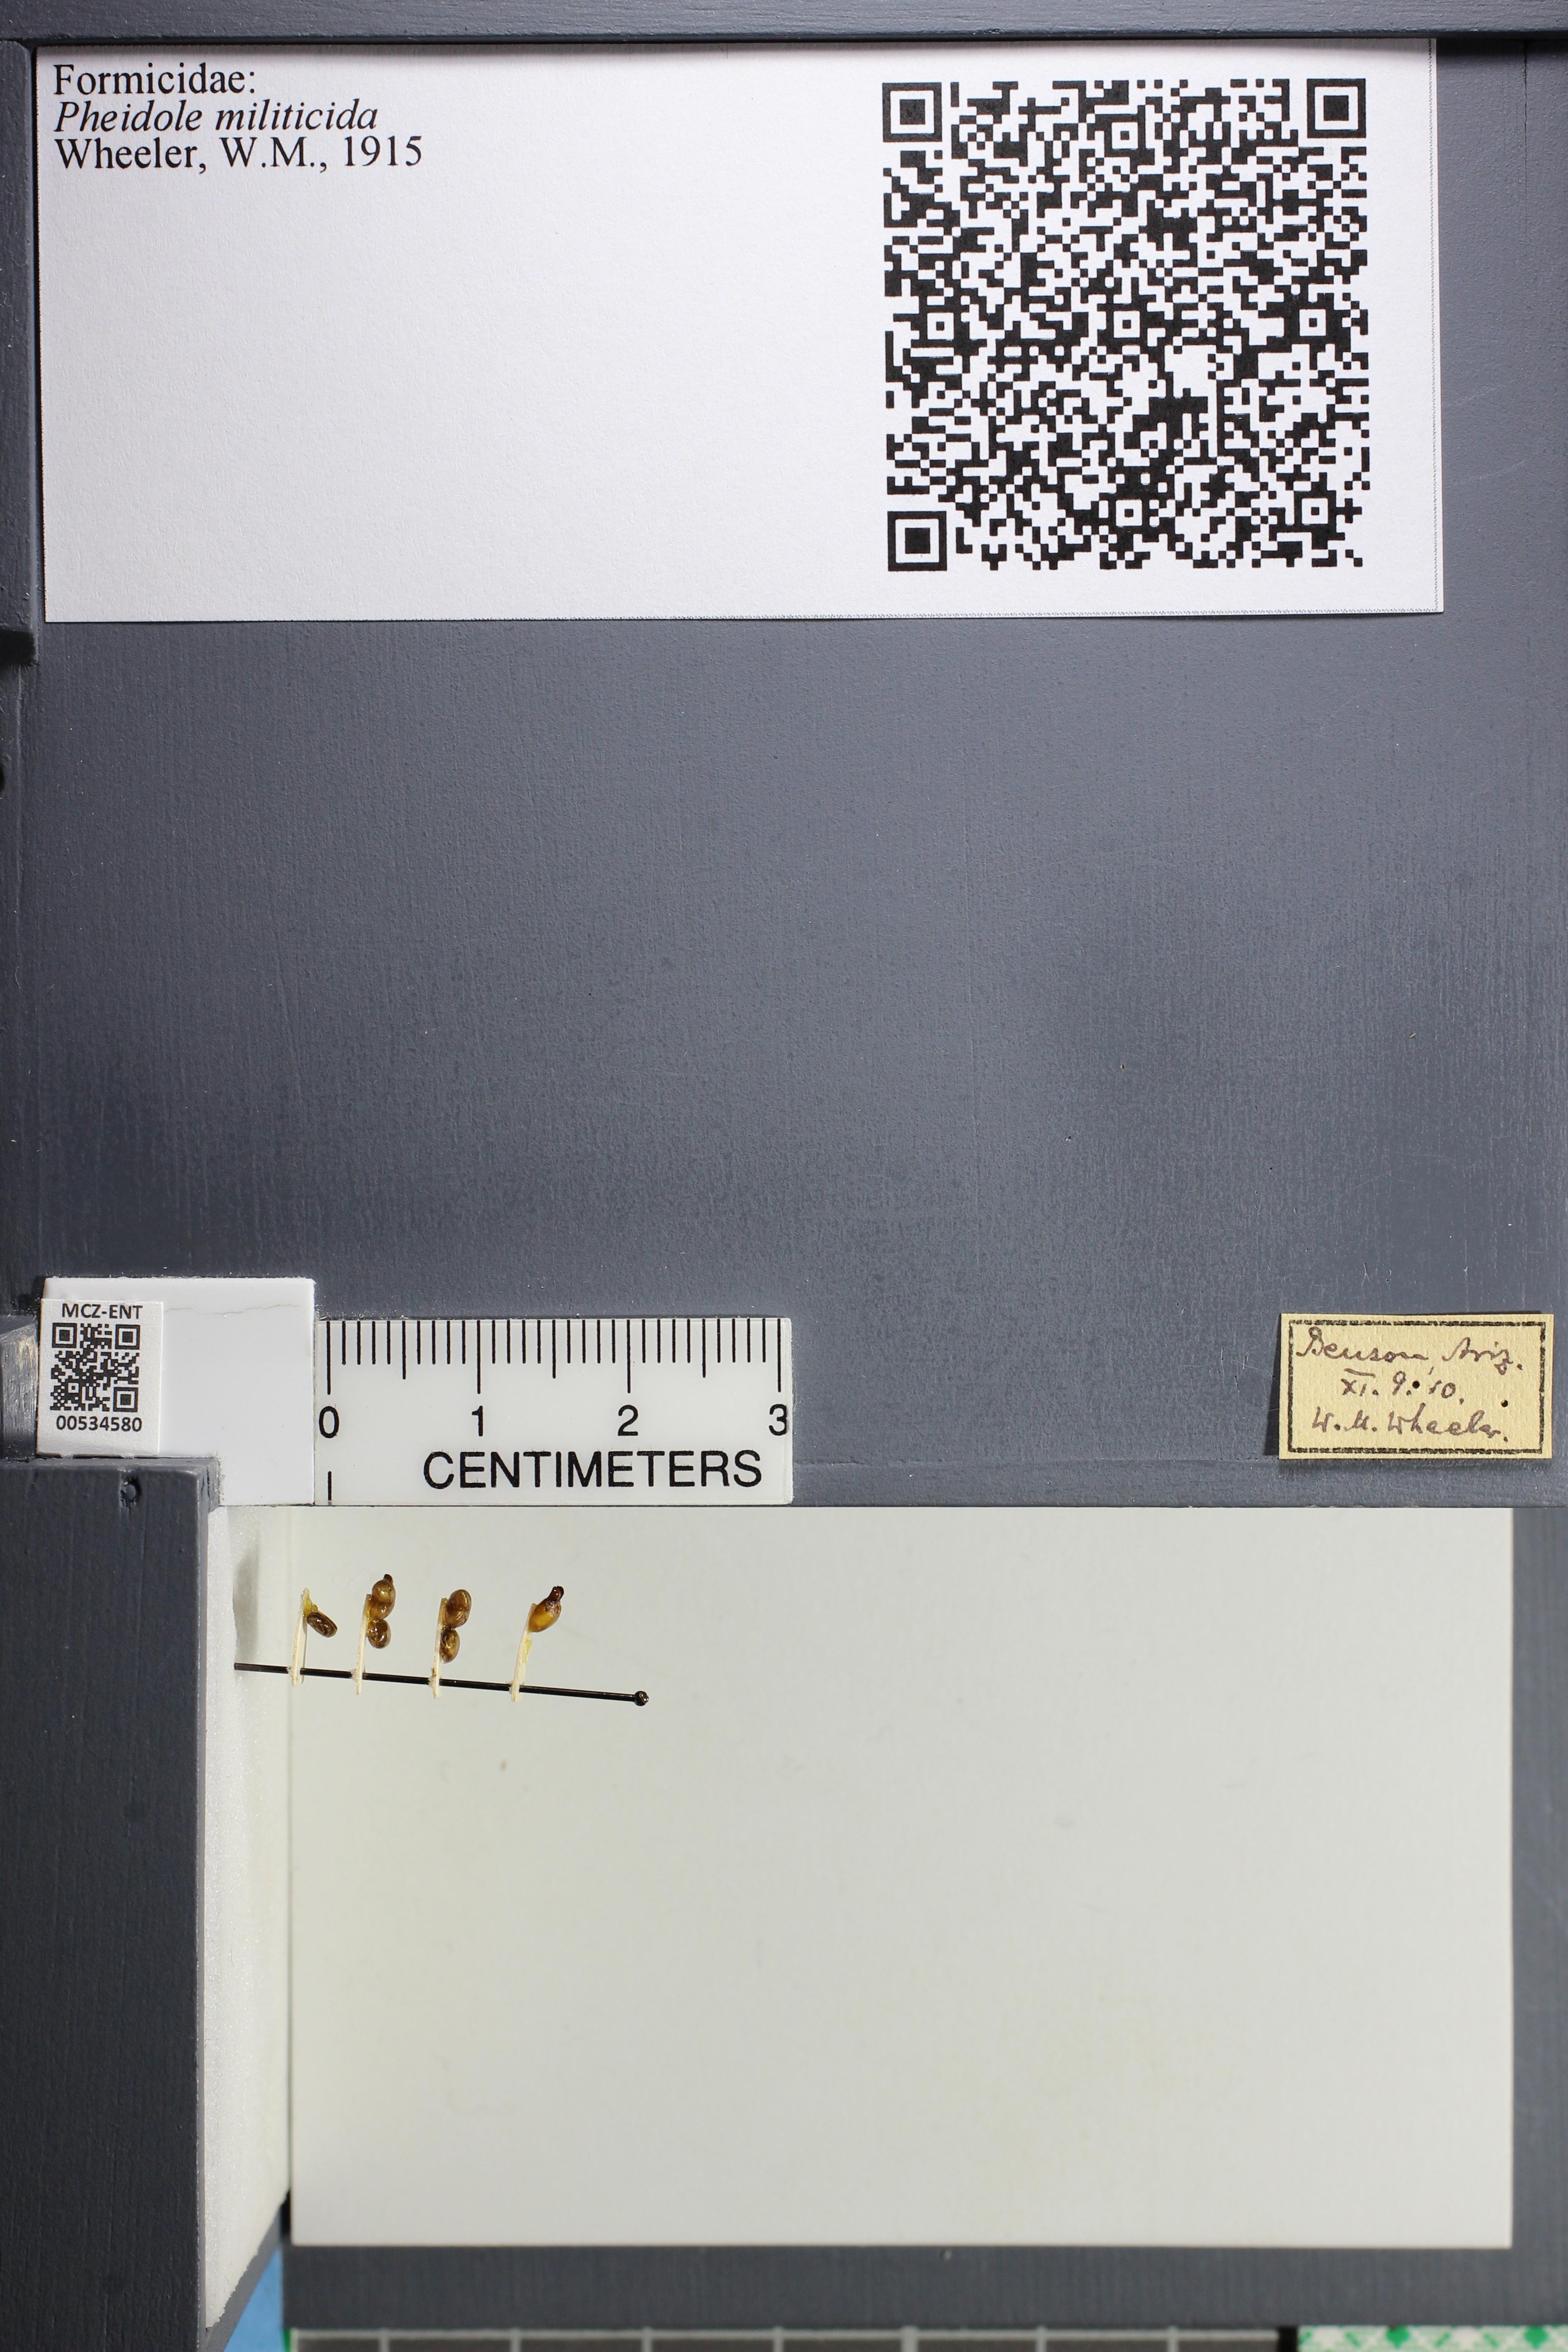 Media of type image, MCZ:Ent:534580 Identified as Pheidole militicida.